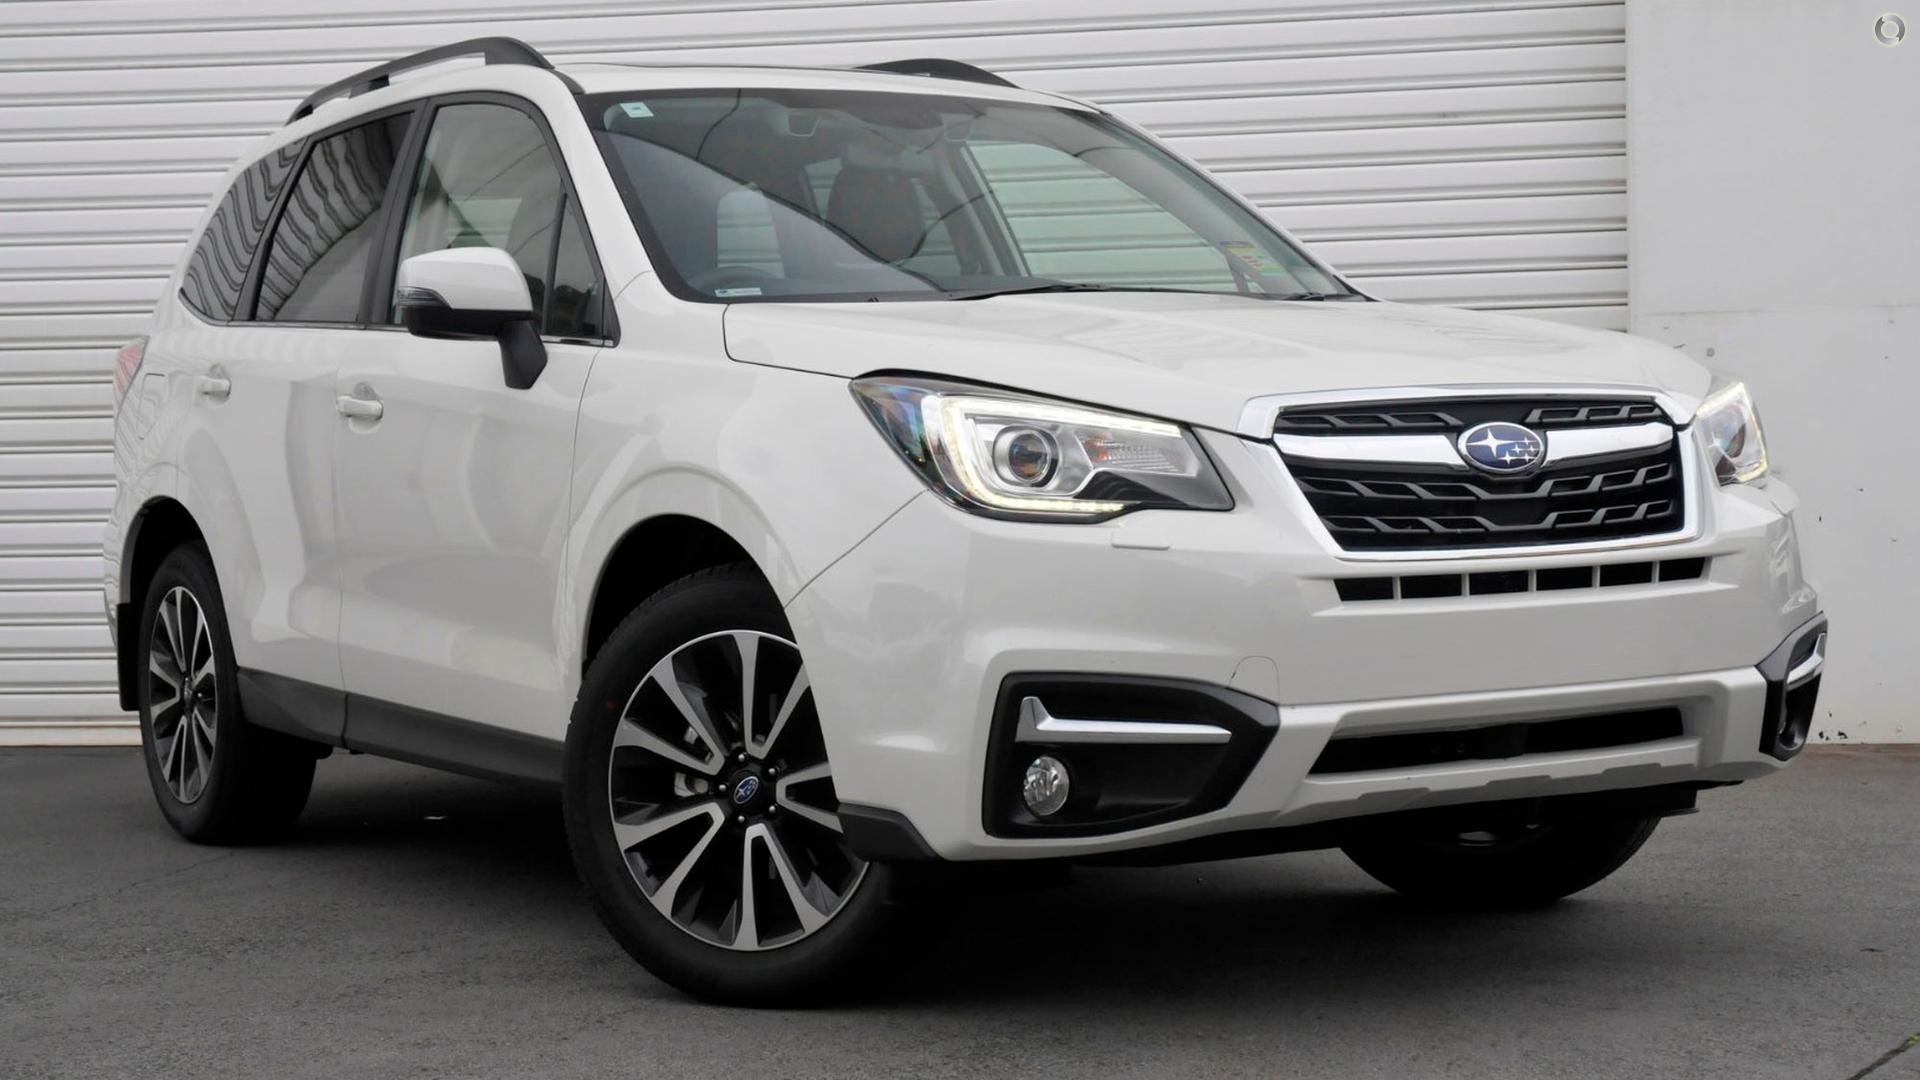 2018 Subaru Forester 2.5i-s